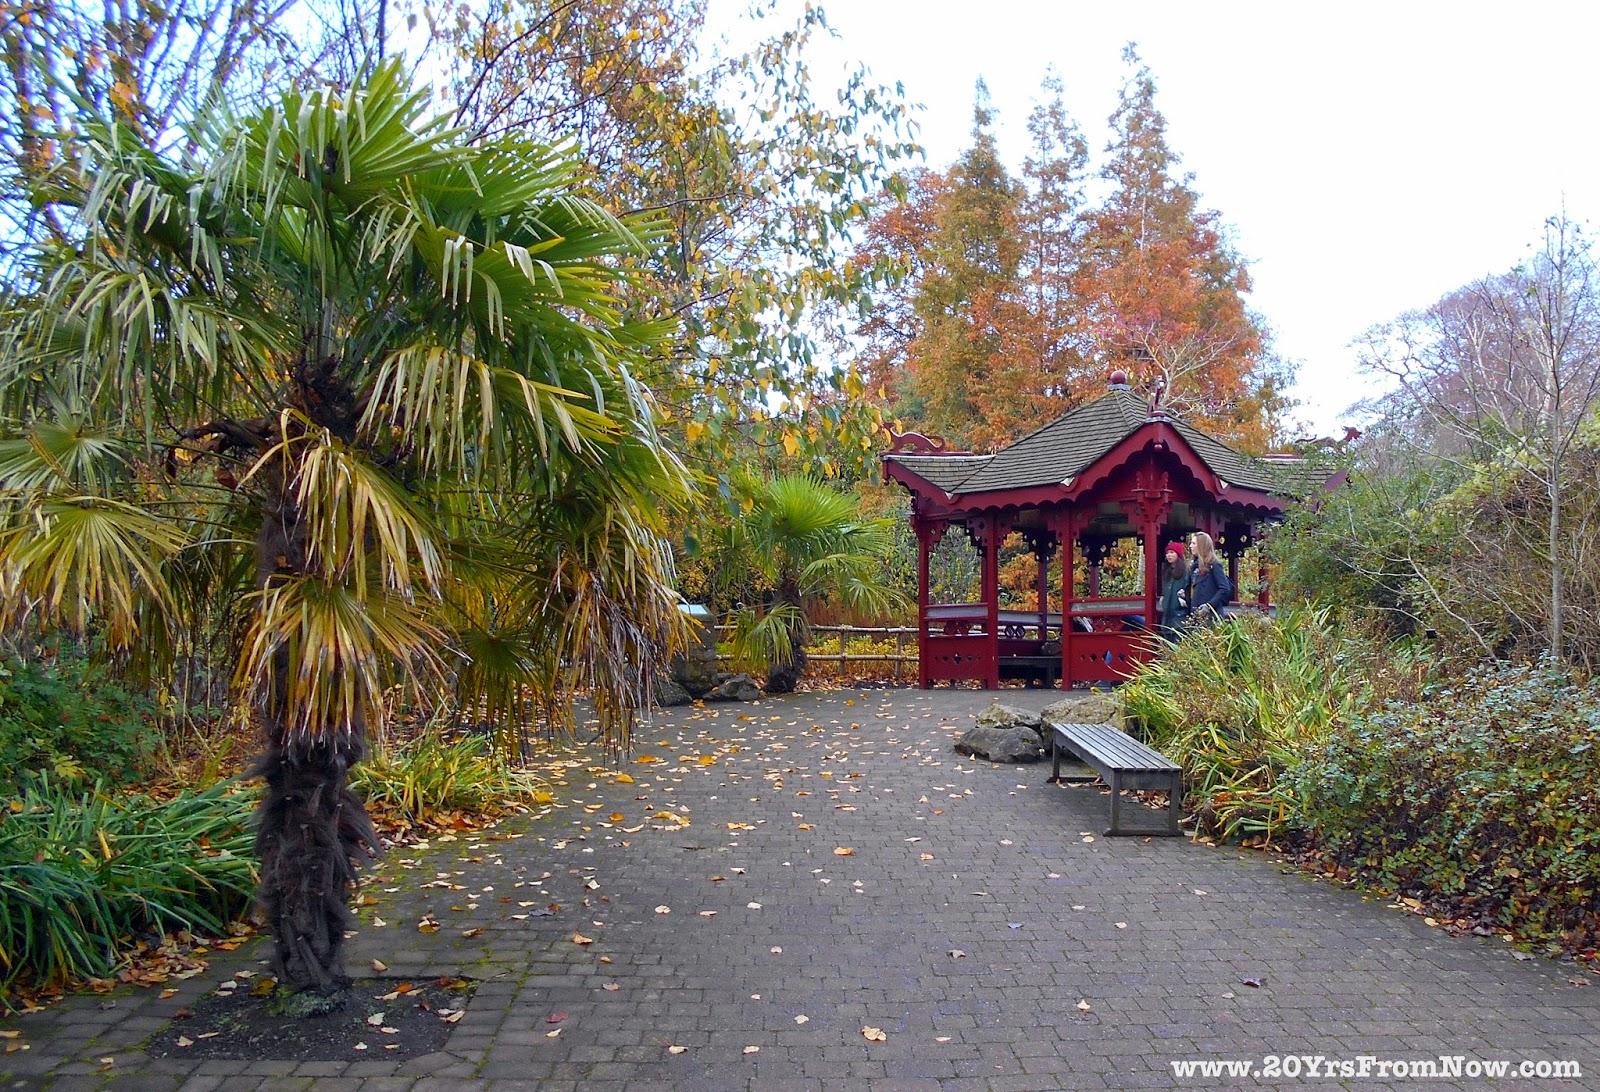 20 Years From Now Royal Botanic Garden Edinburgh